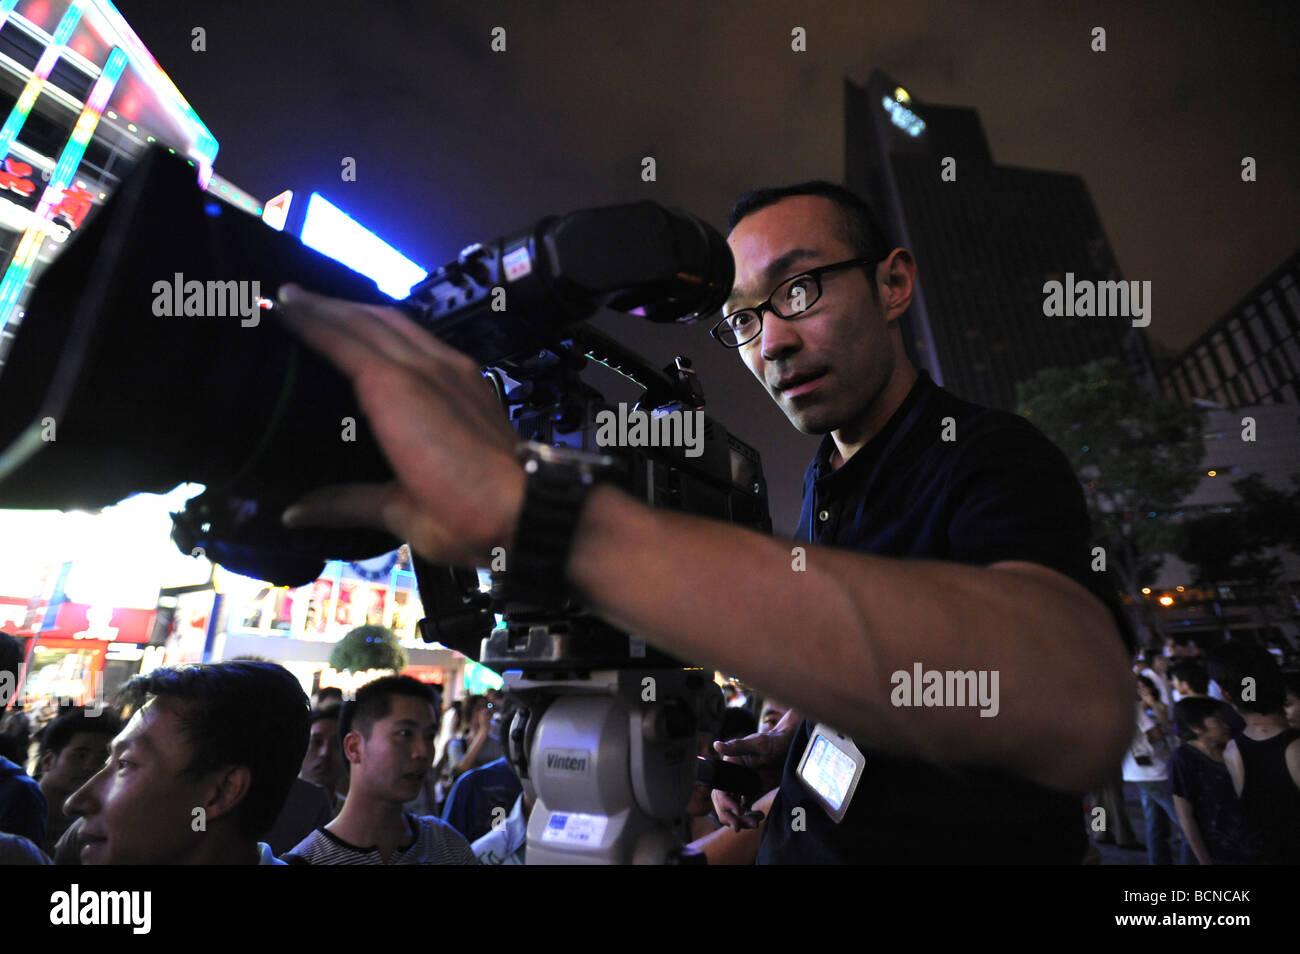 TV crew shooting footages on Najing Road, Shanghai, China - Stock Image